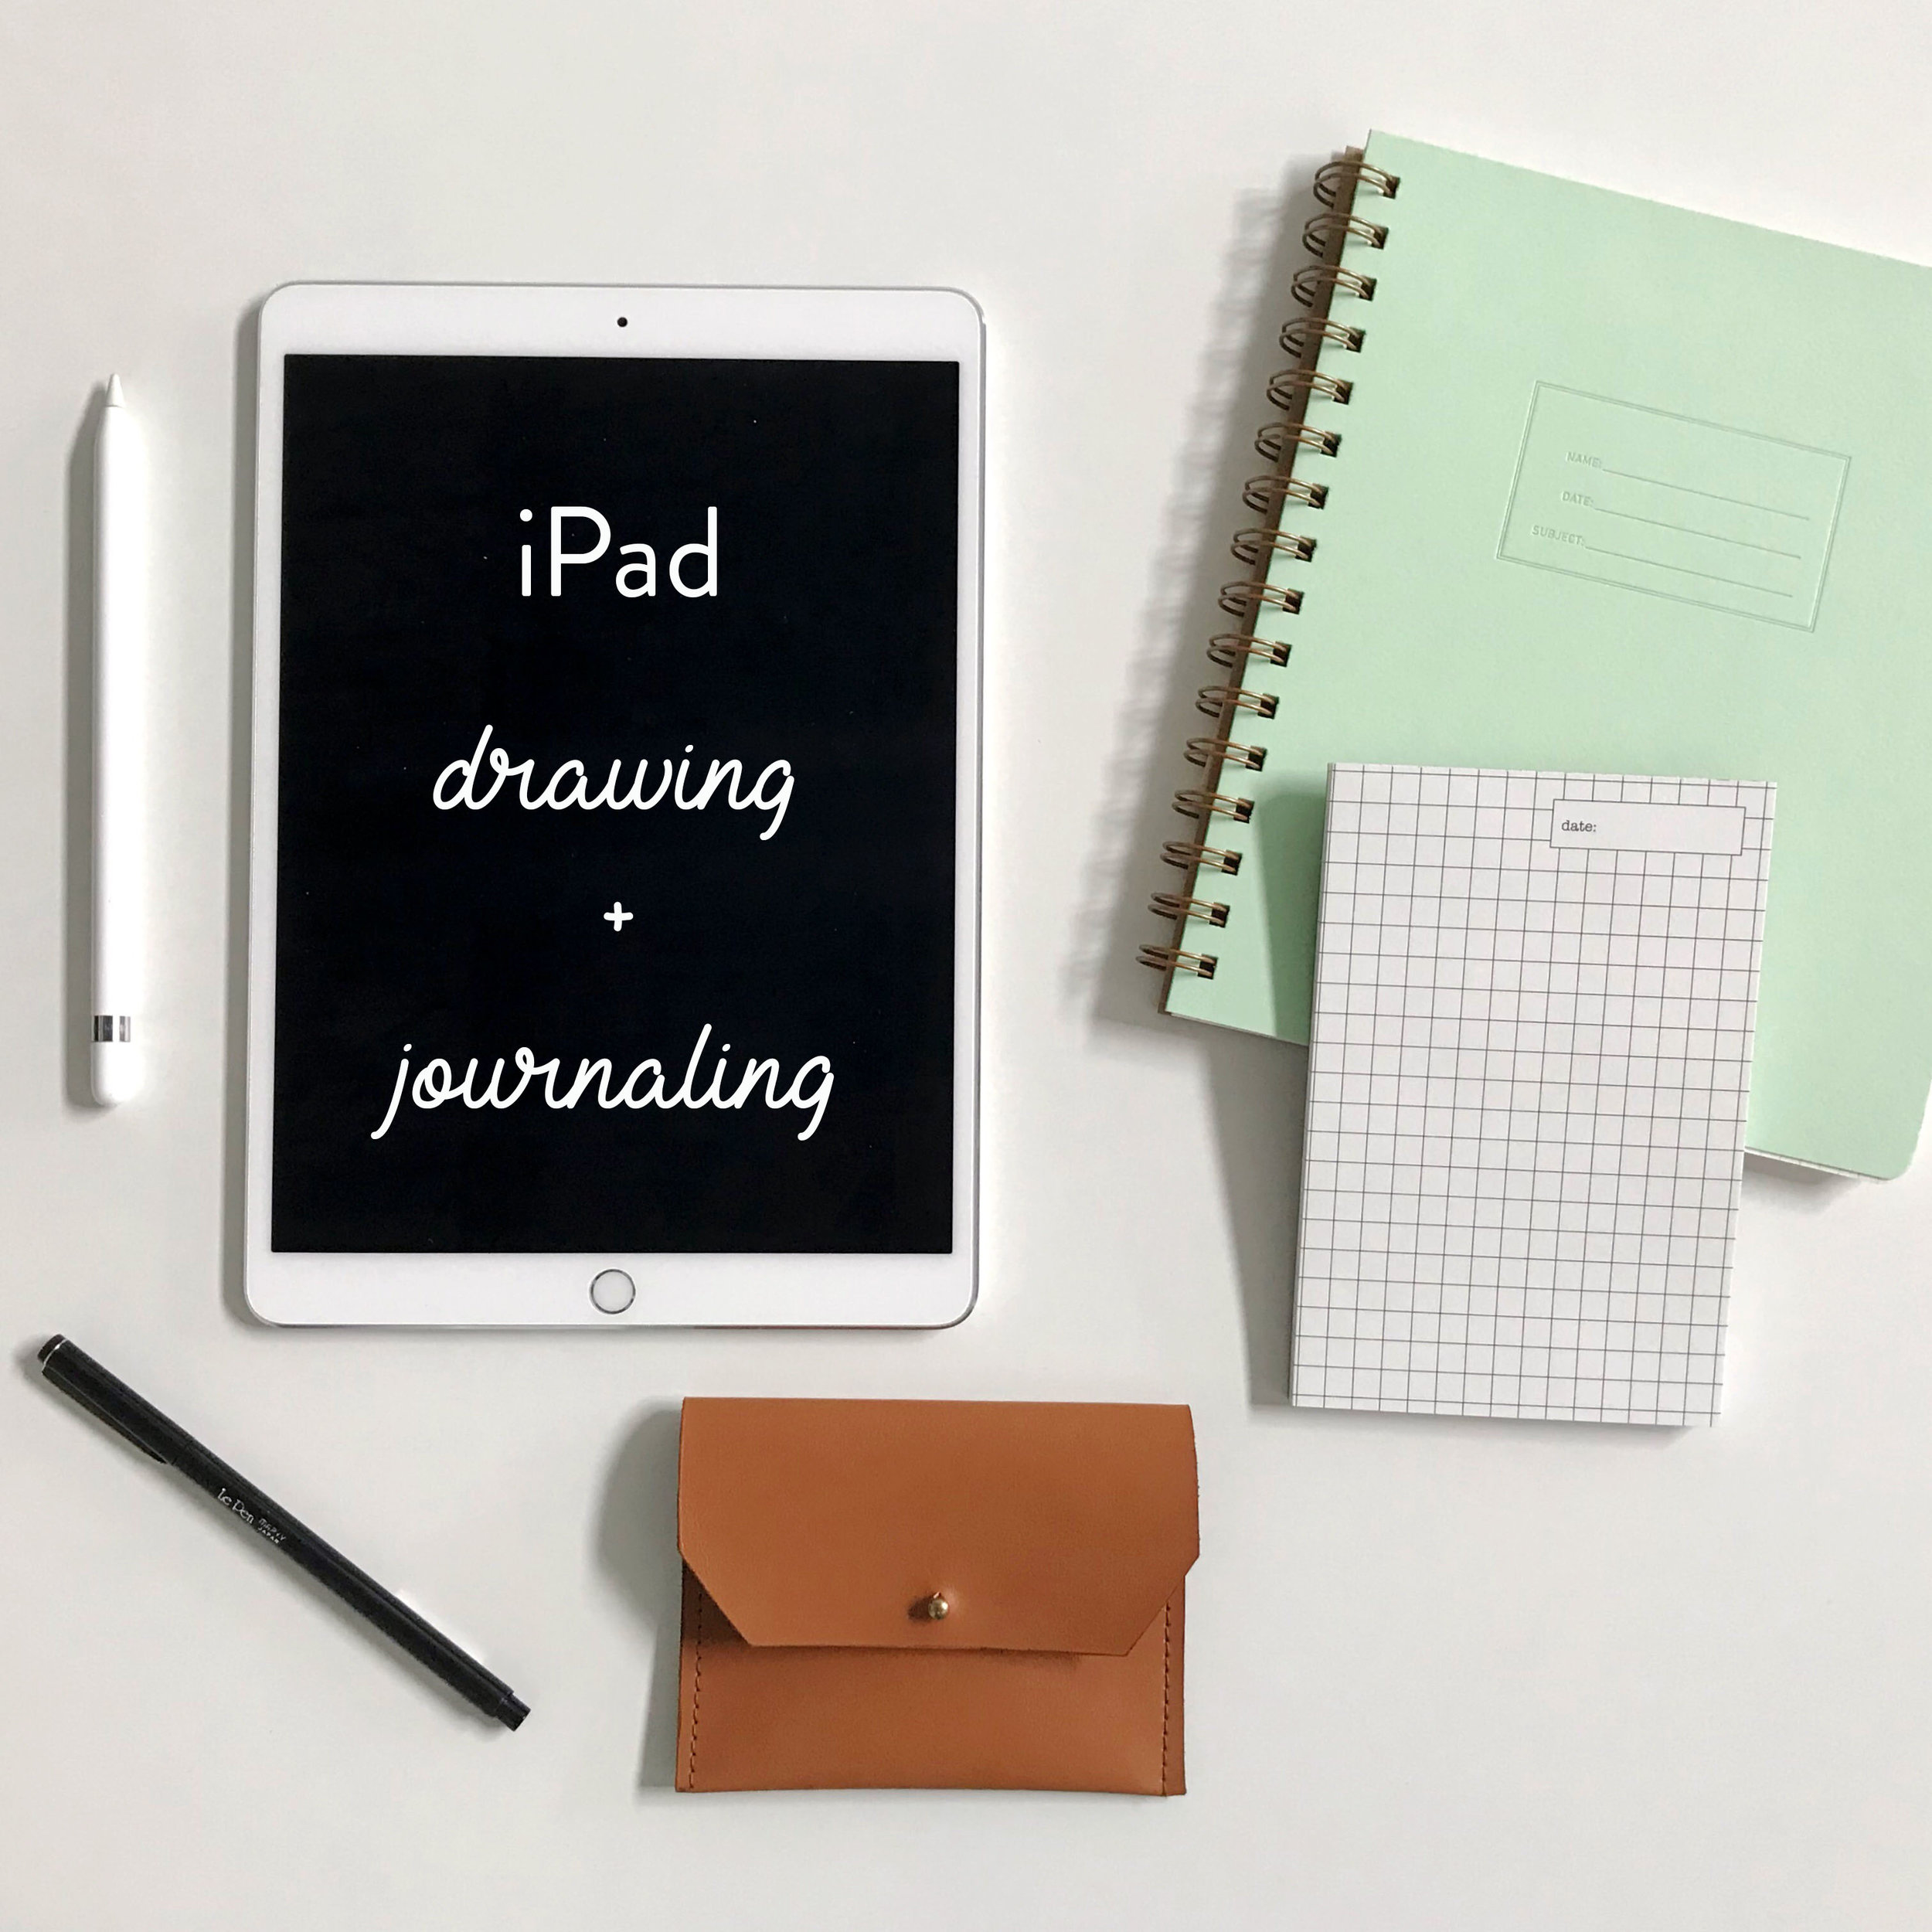 papercraftpantry-workshops-beginners-ipad-drawing.jpg